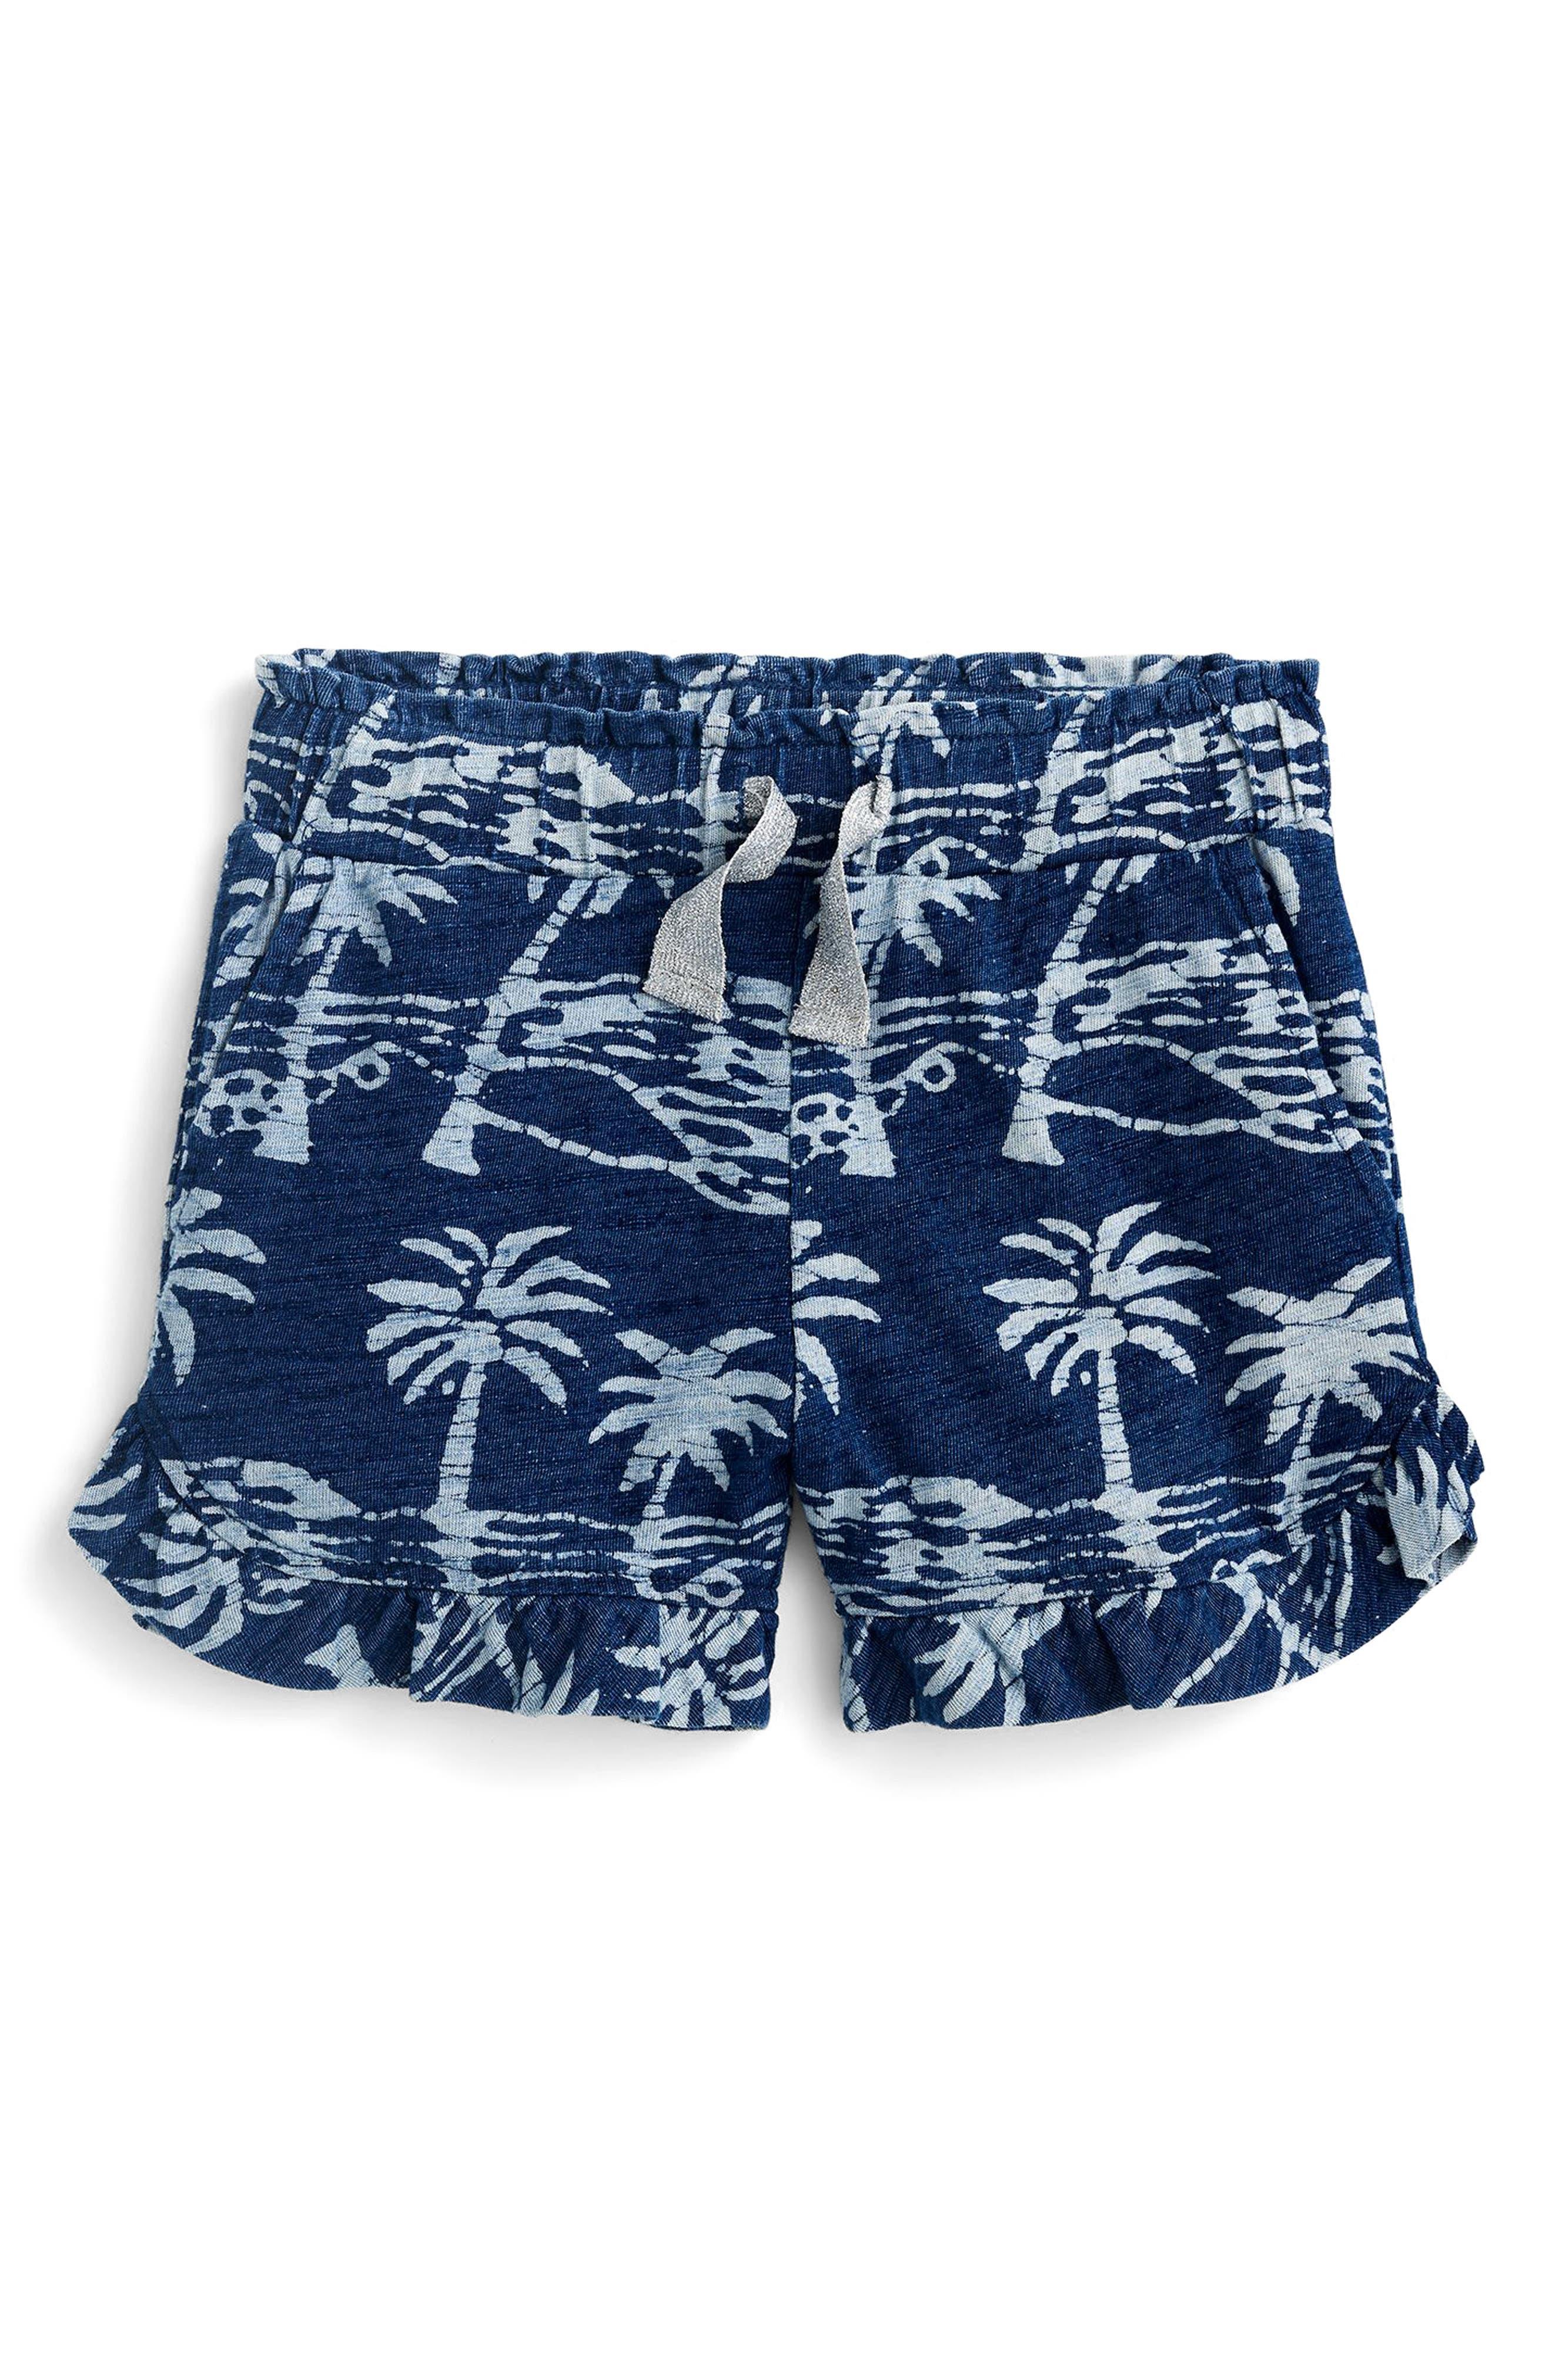 Paulette Palm Print Ruffle Shorts,                             Main thumbnail 1, color,                             Indigo